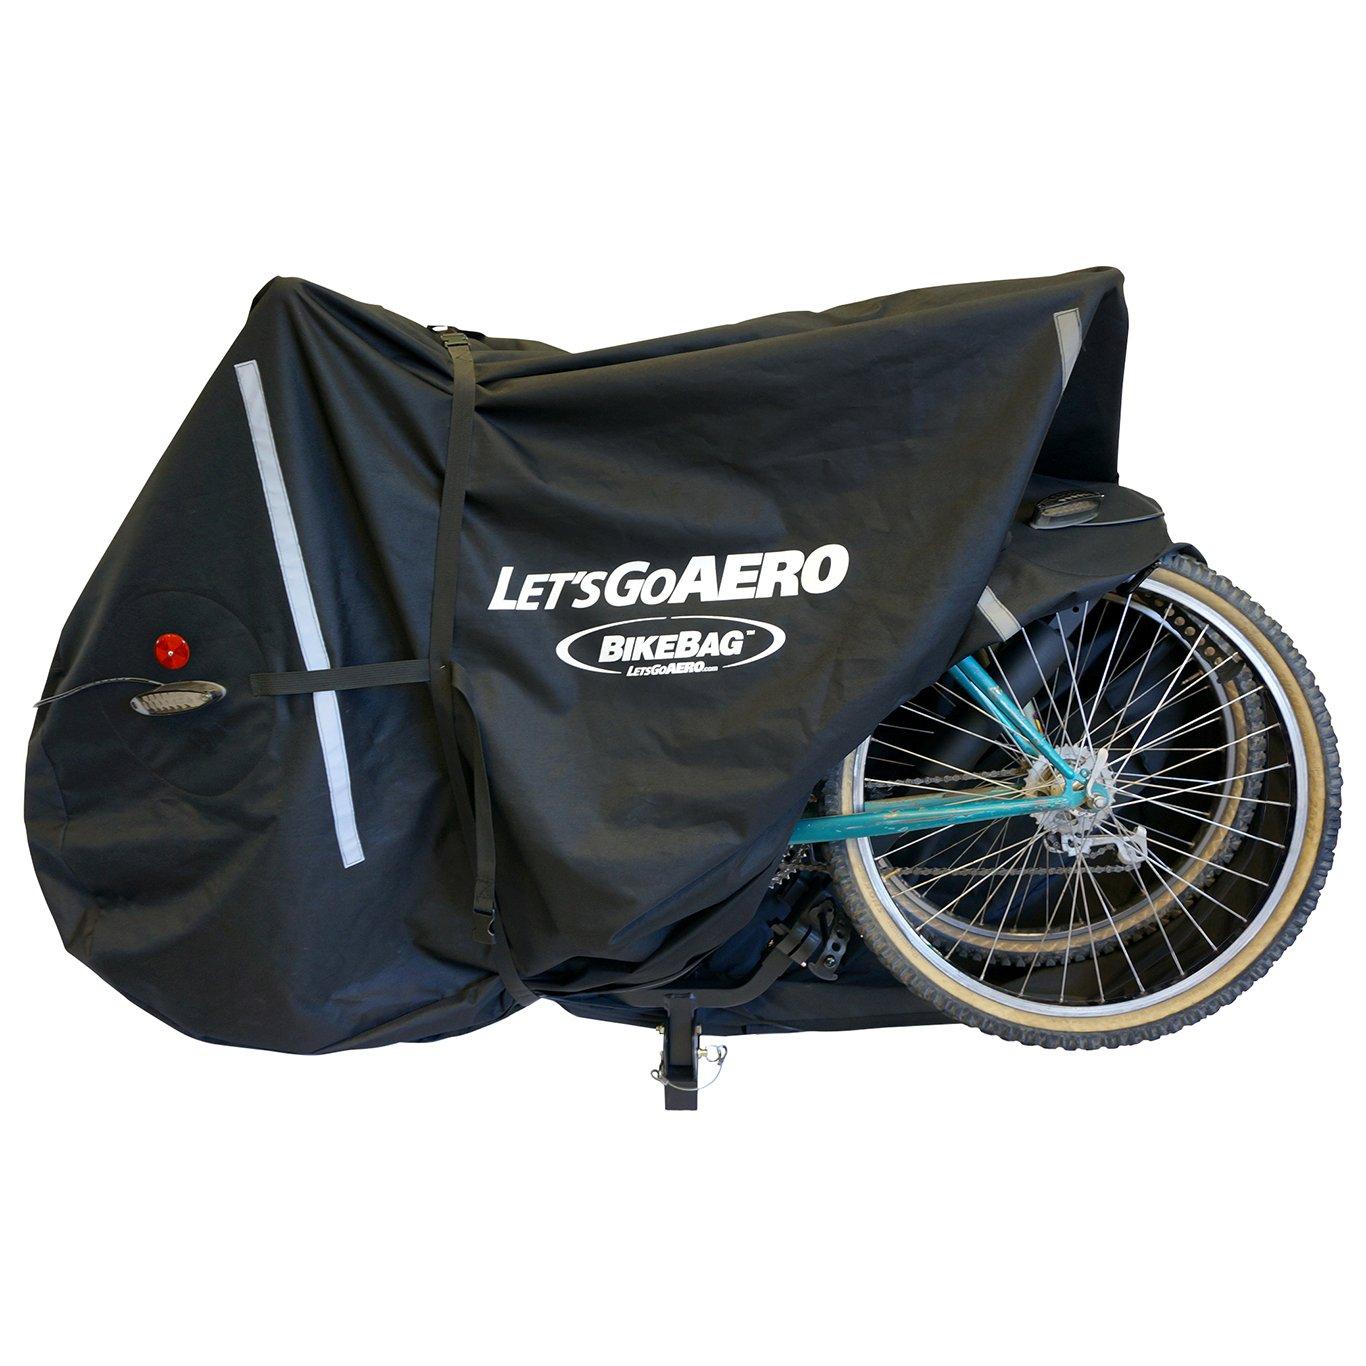 Lets Go Aero B01571 BikeBag 2-Bike Cover with LED Let/'s Go Aero